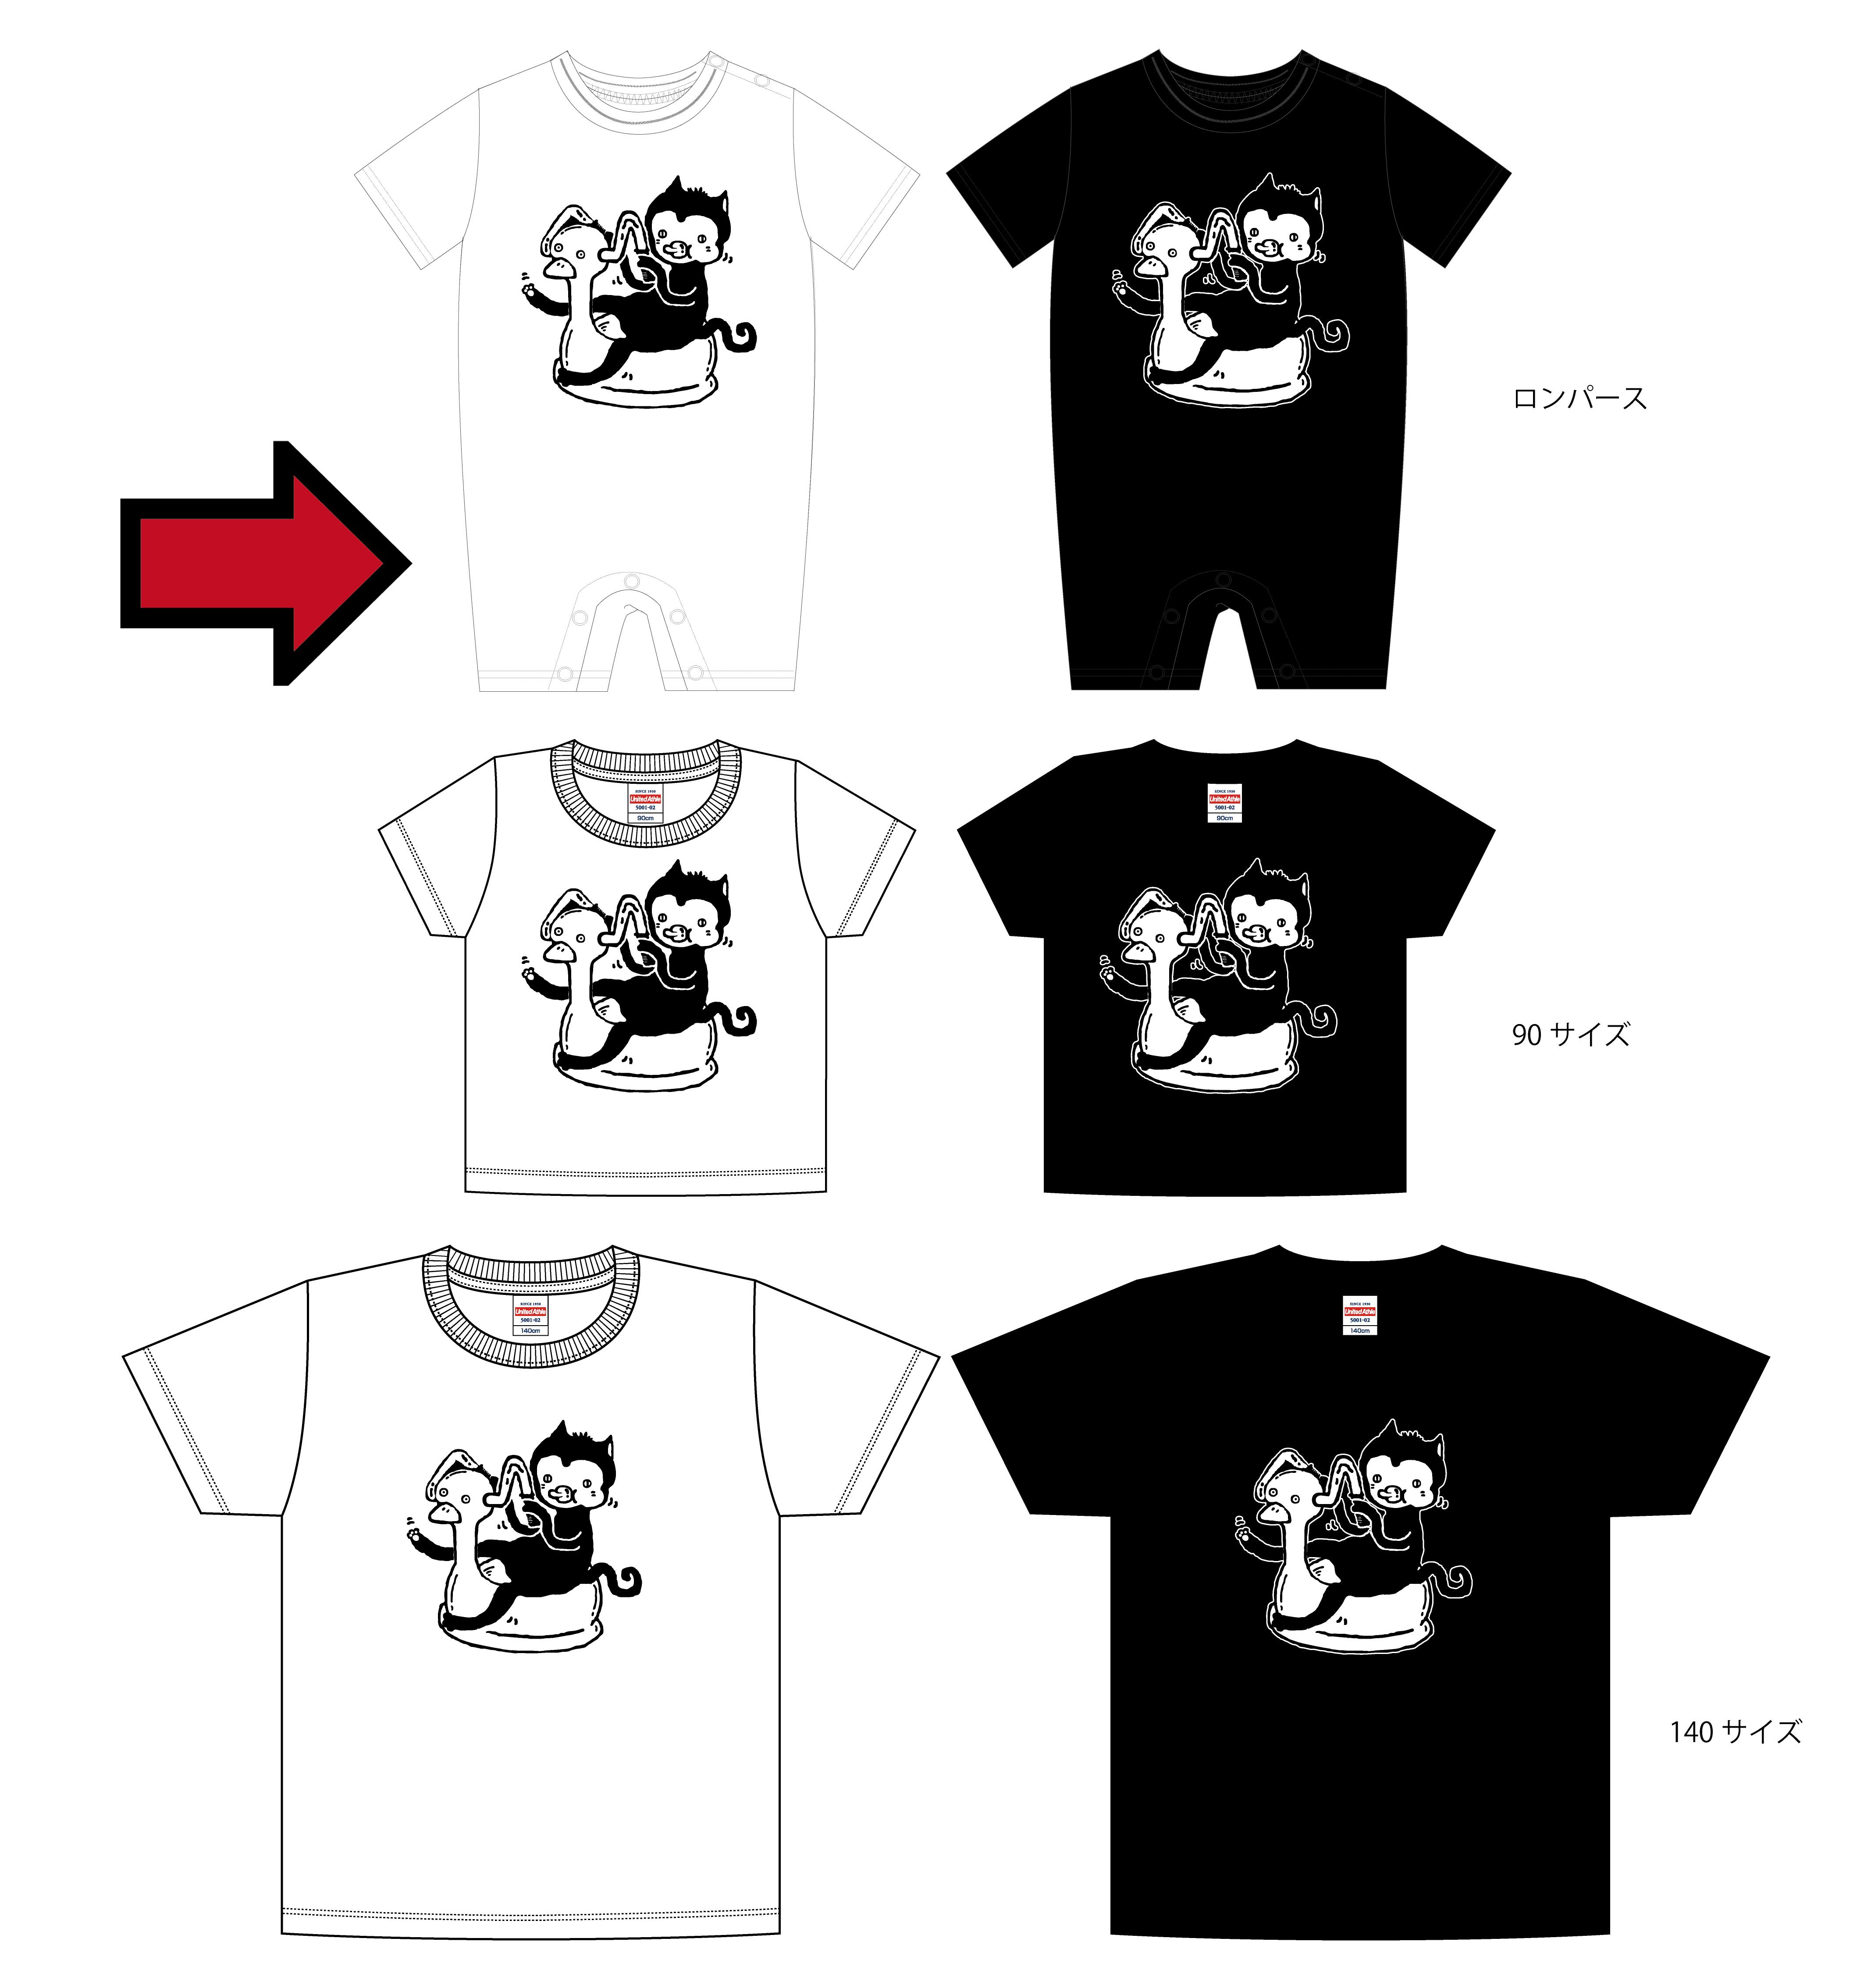 BathroomBABYCAT T-shirt (White)